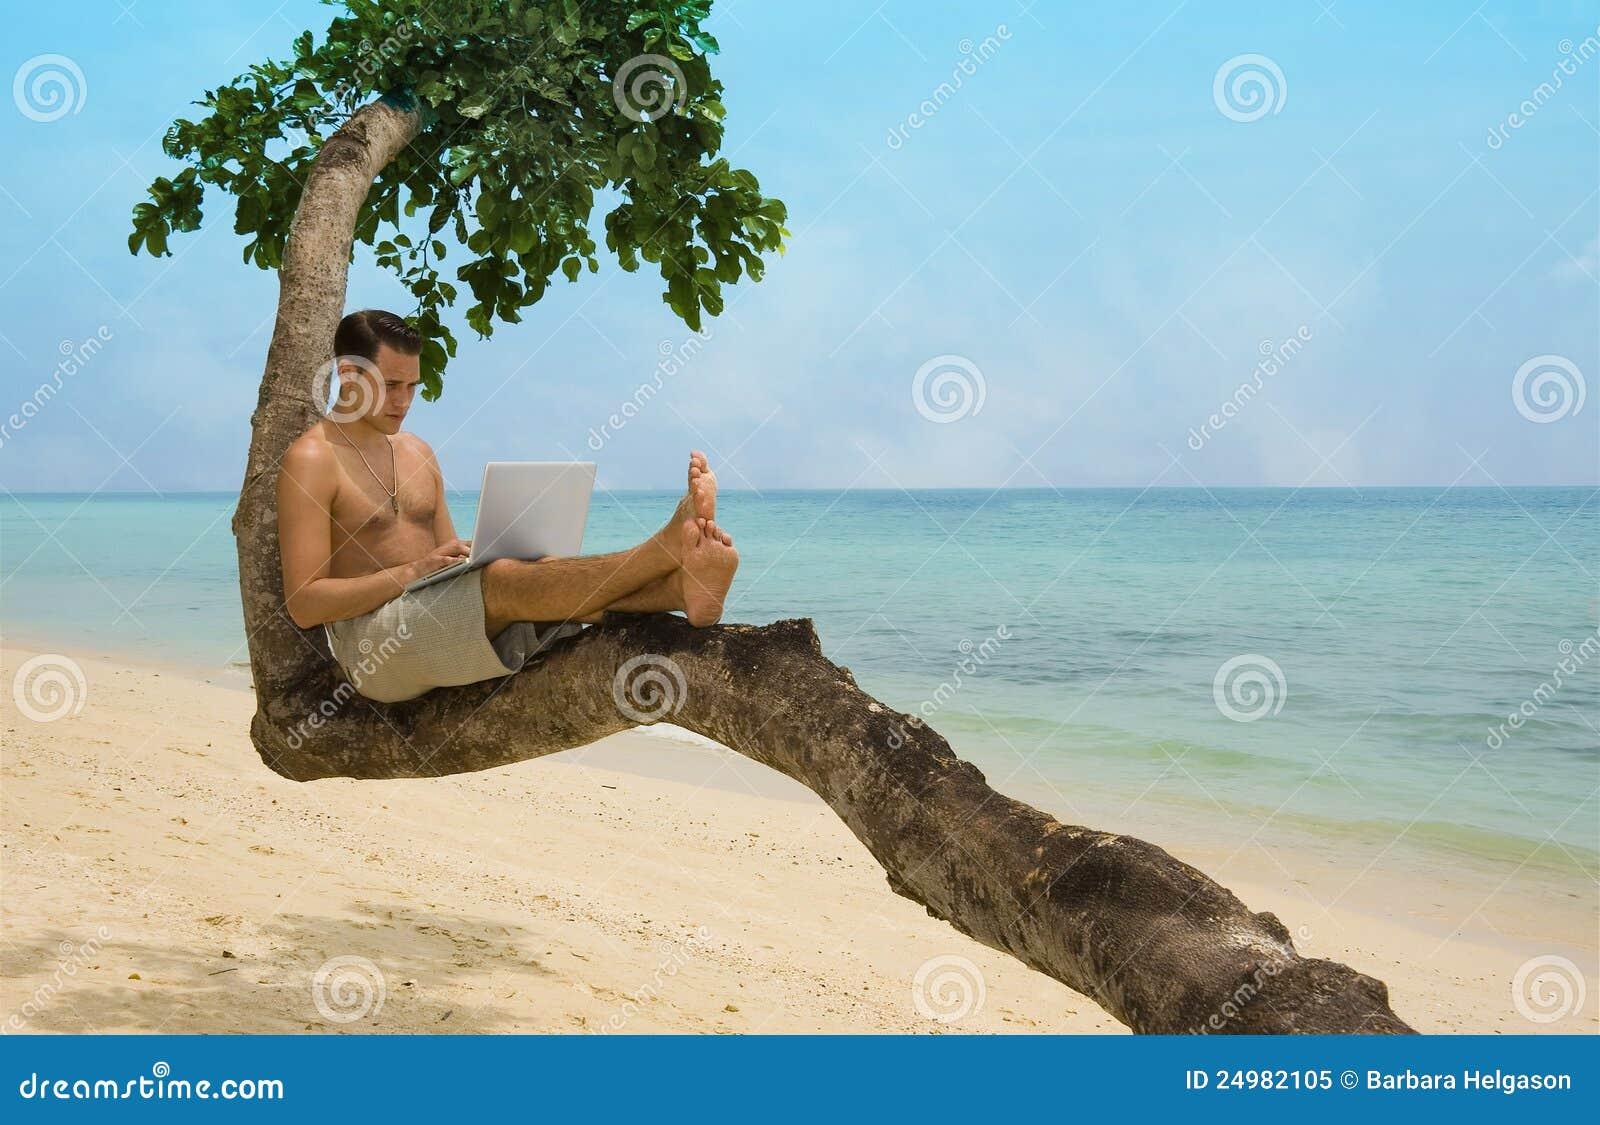 Palm Beach Tan Prices >> Beach Laptop Vacation Royalty Free Stock Photo - Image: 24982105